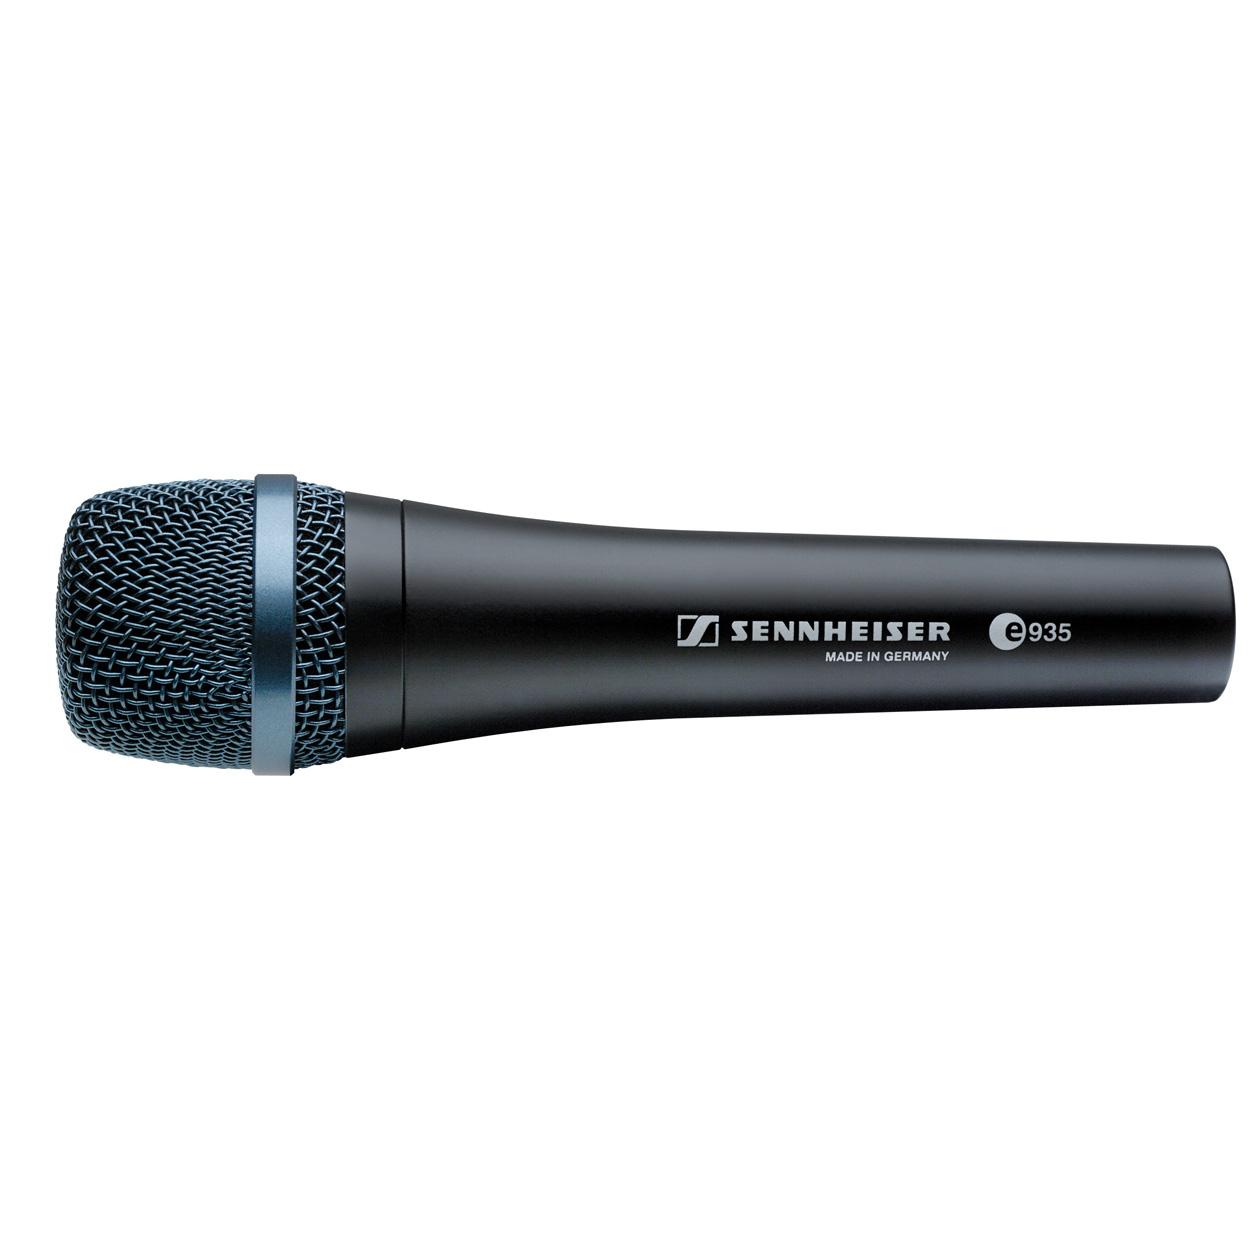 Afbeelding van Sennheiser E 935 zangmicrofoon dynamisch met nier karakteristiek